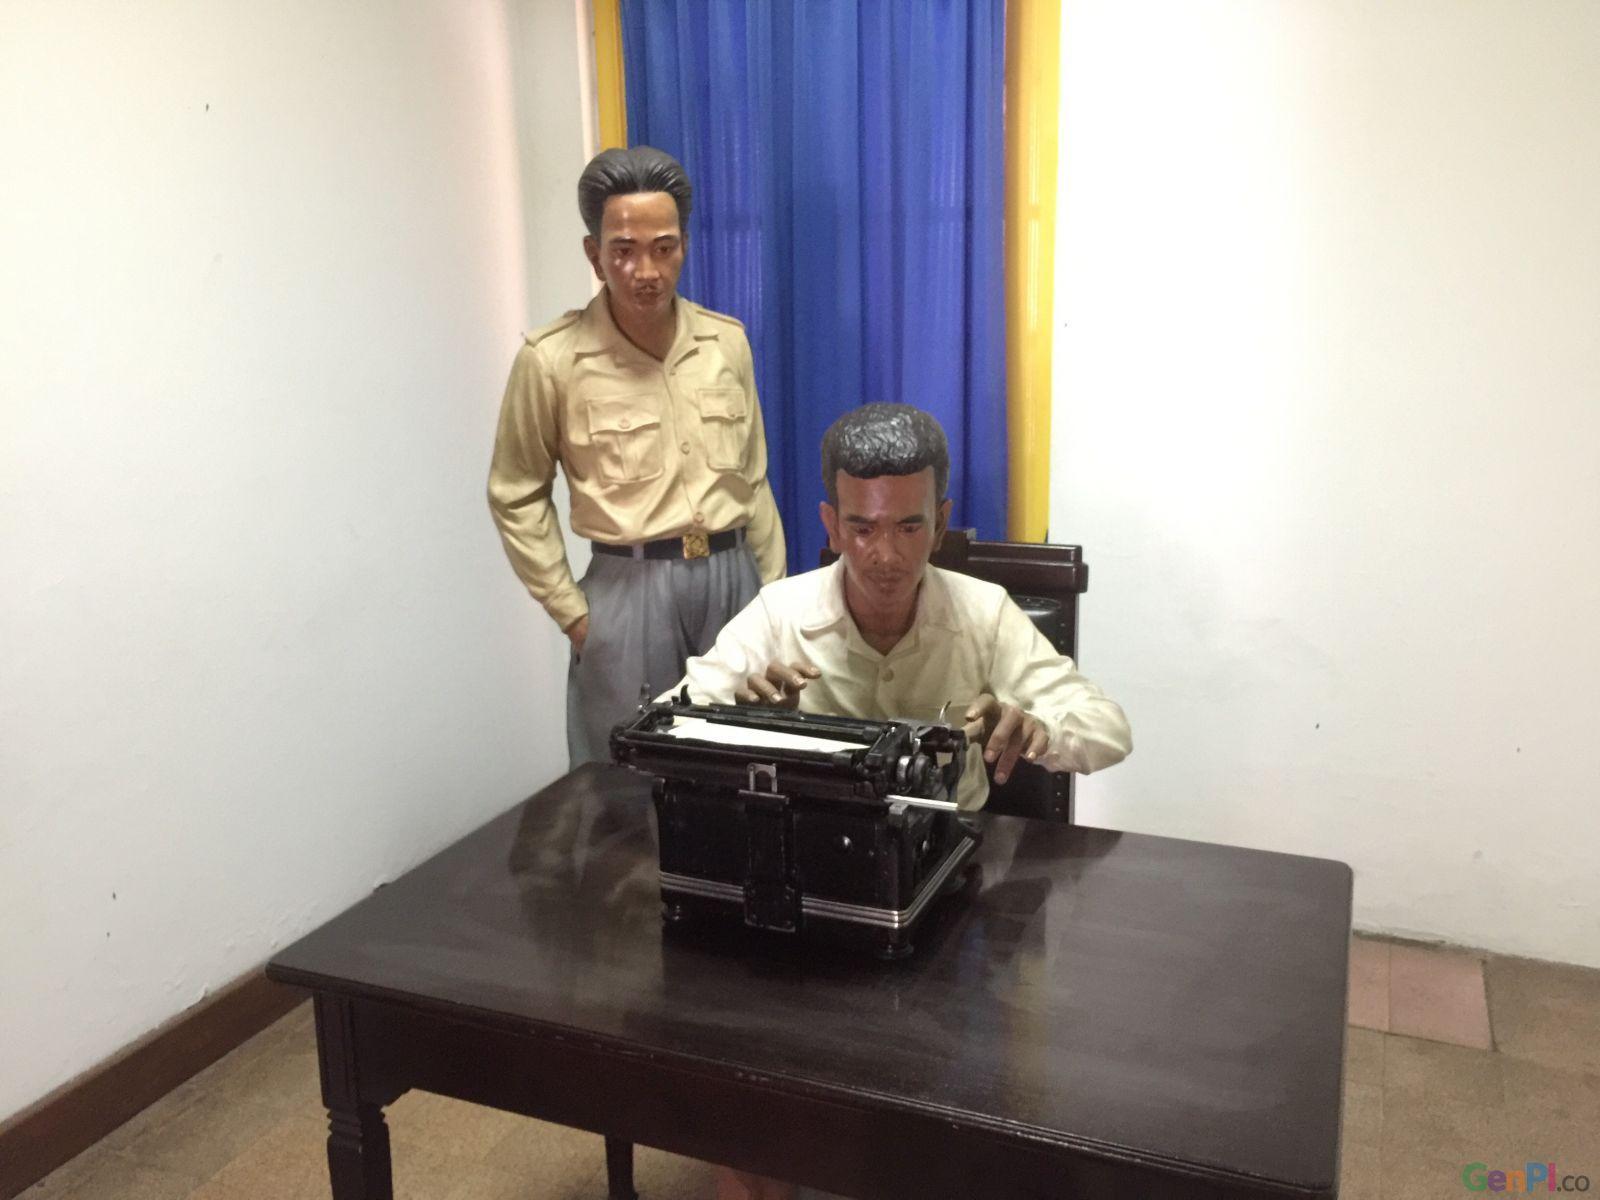 Diorama pengetikan naskah Proklamasi di Museum Perumusan Naskah Proklamasi, Jakarta. (Foto: Hafid/GenPI.co)